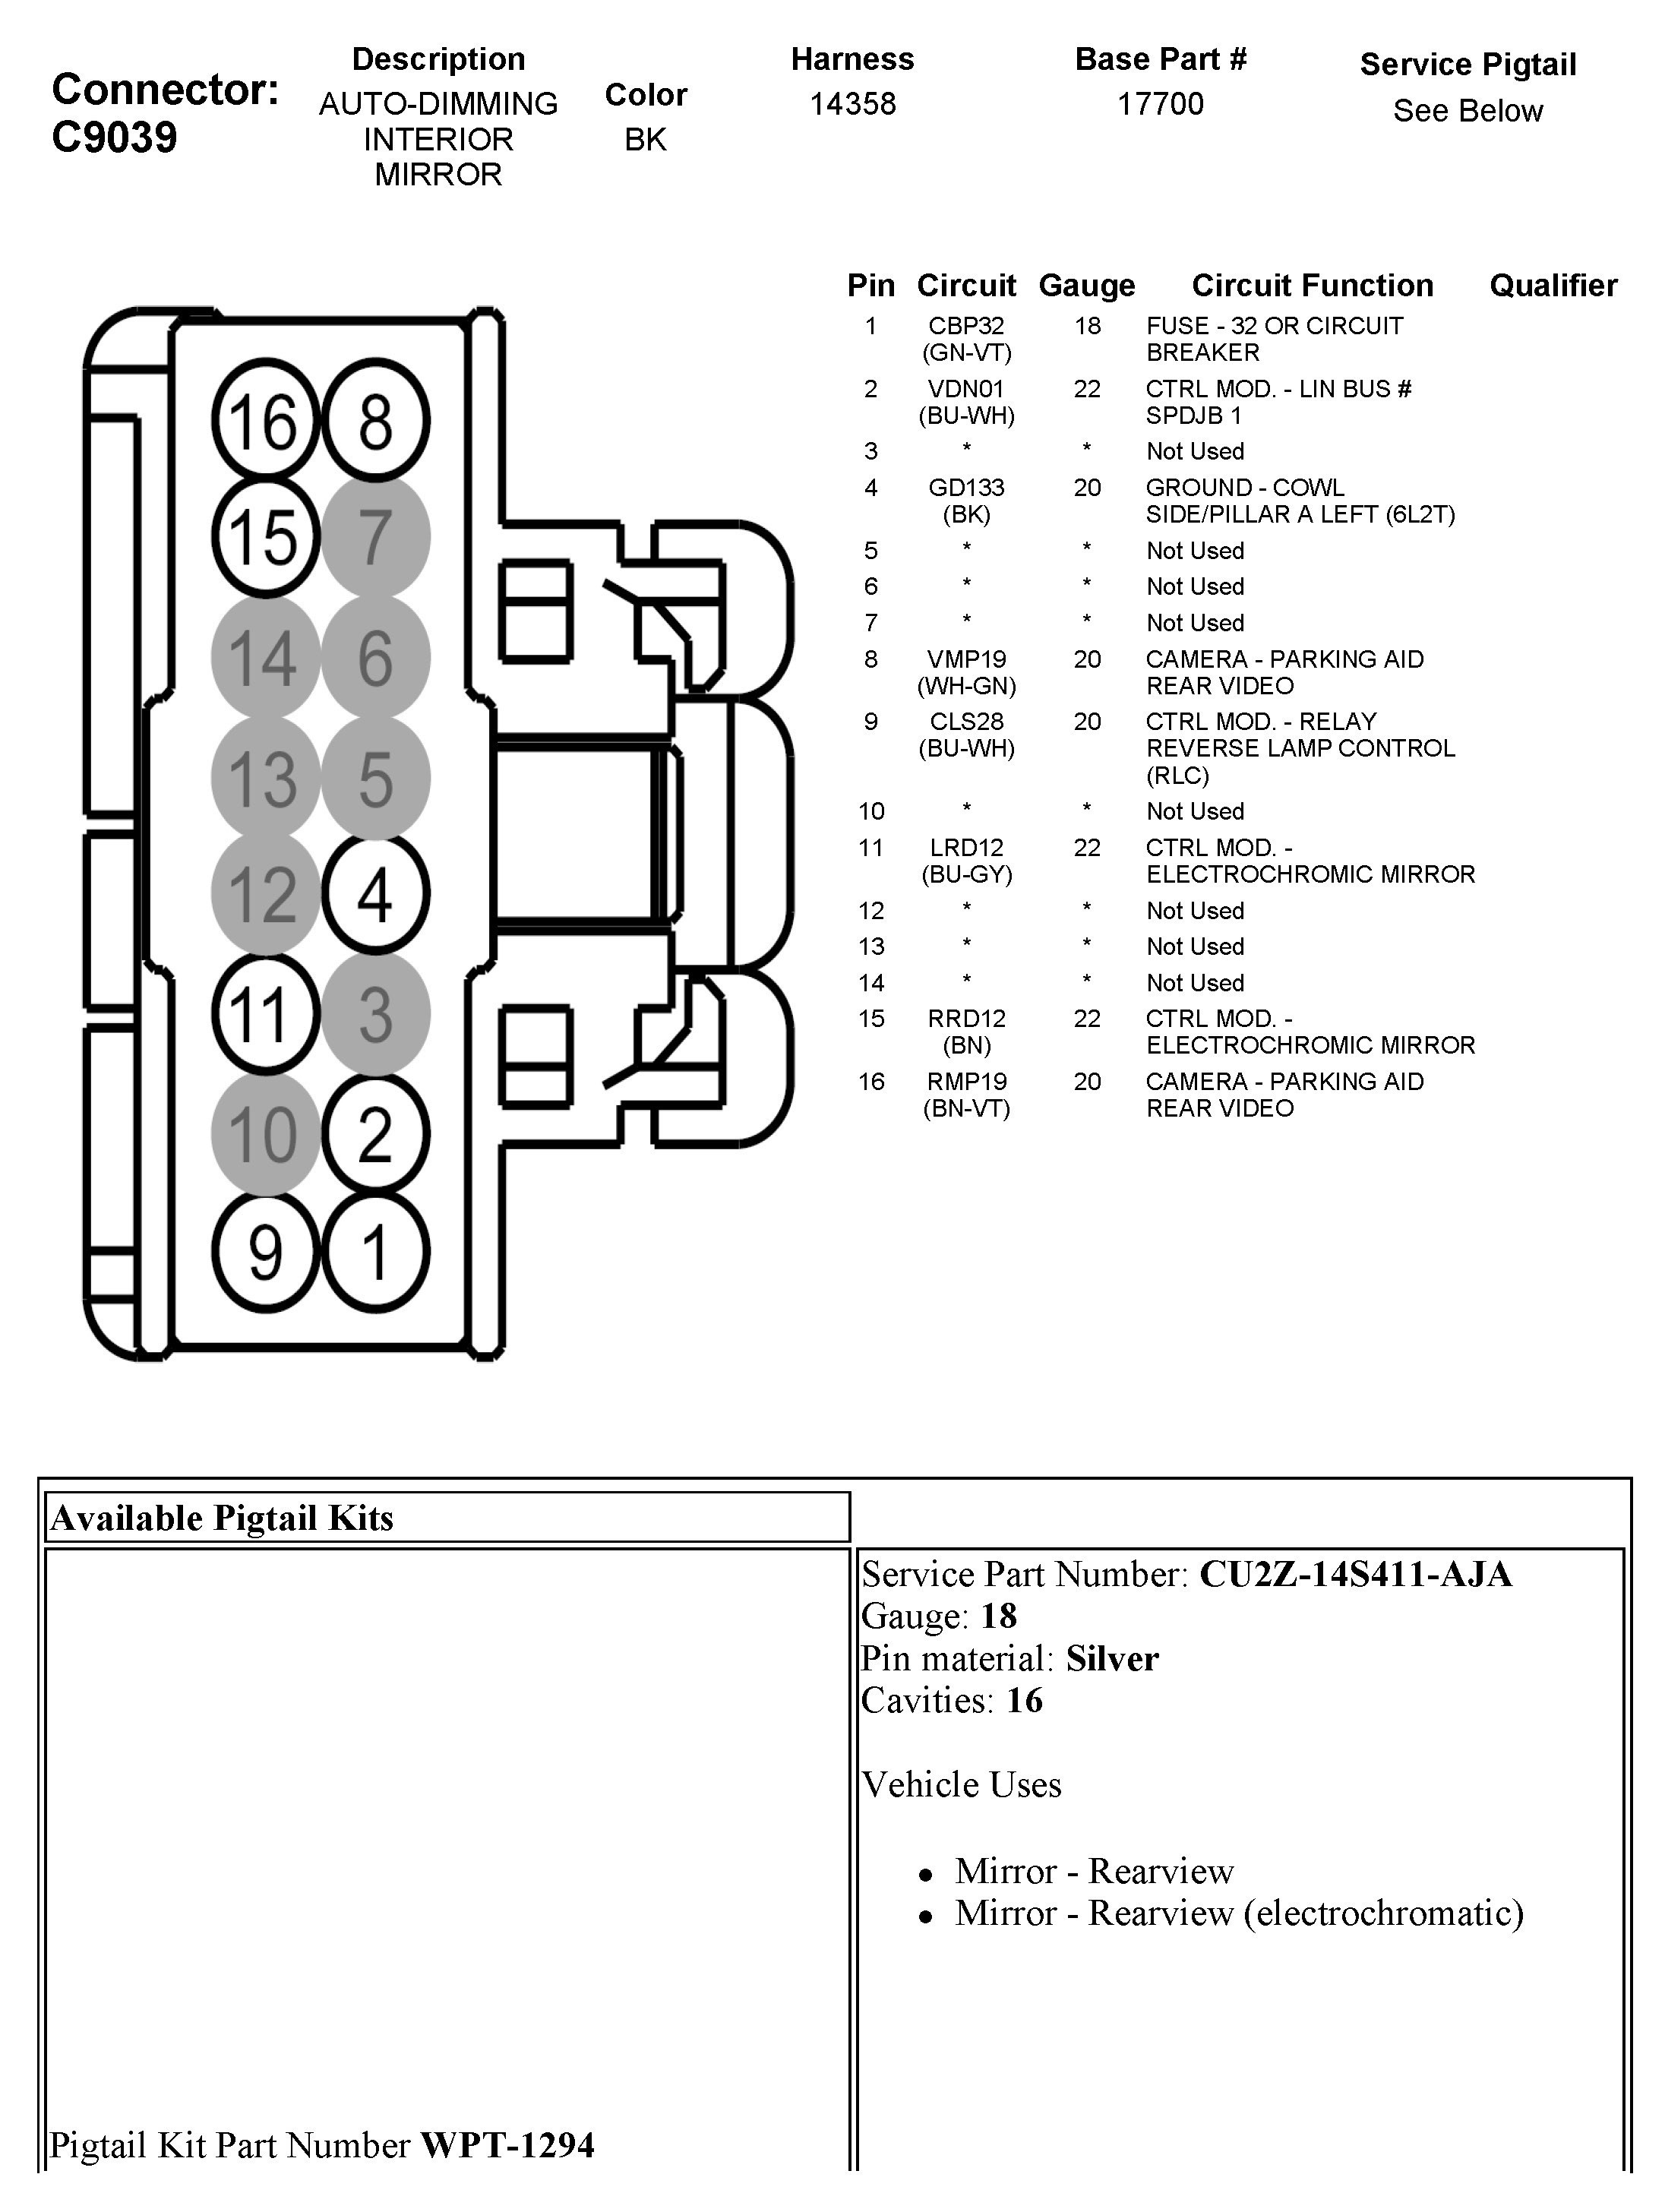 Gentex 313 Vs 453 Gentex 313 10 Pin Wiring Diagram Wiring Diagram Schematic Of Gentex 313 Vs 453